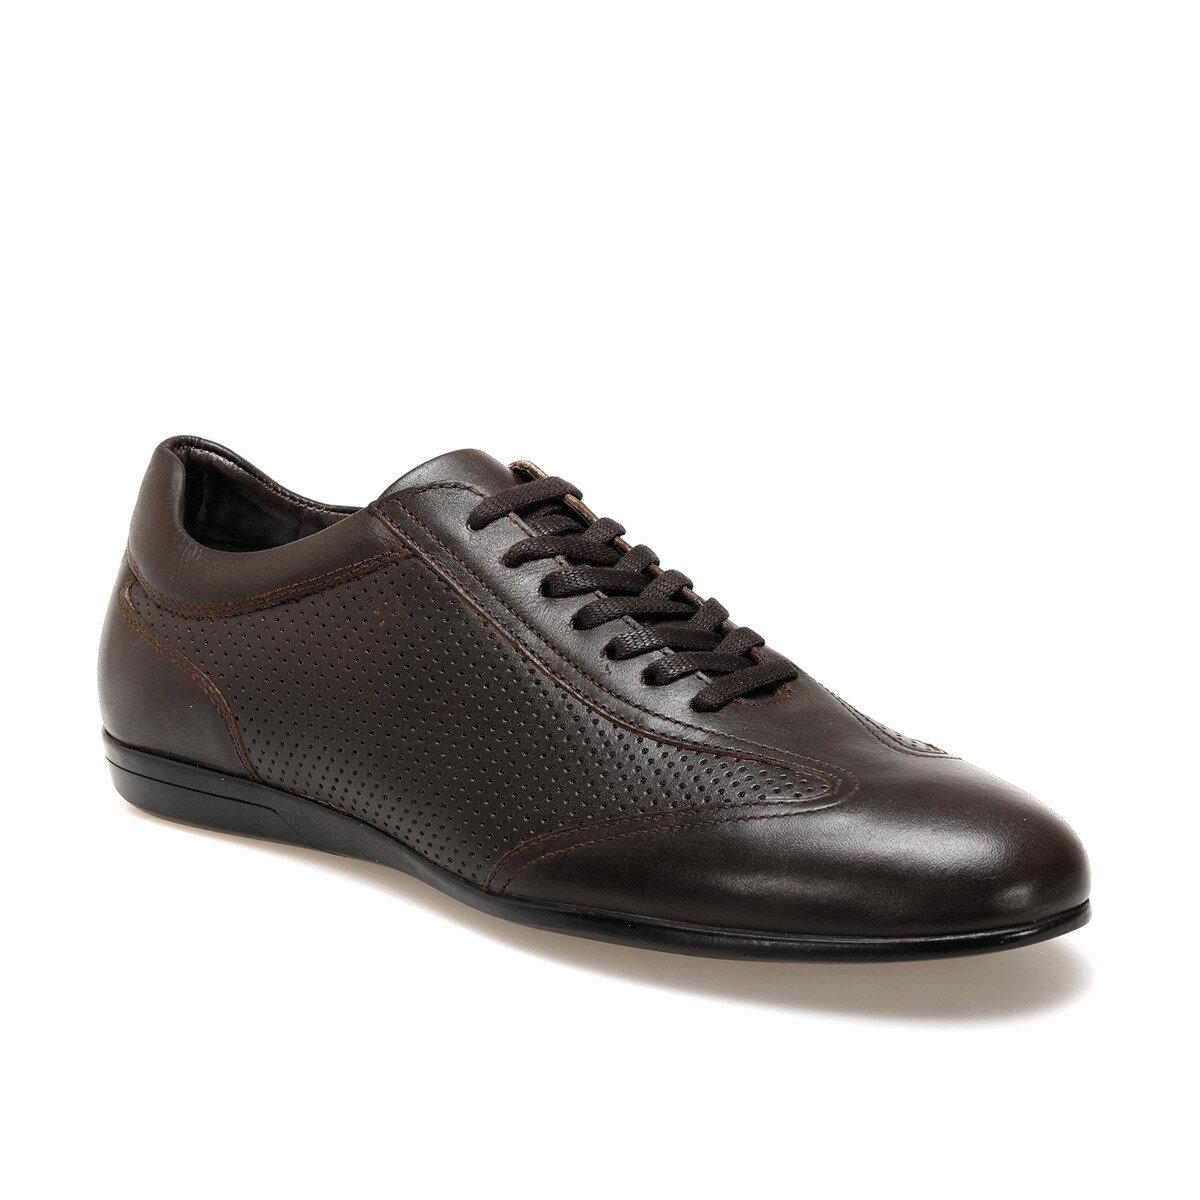 FLO GBS21 Black Men Casual Shoes Oxide